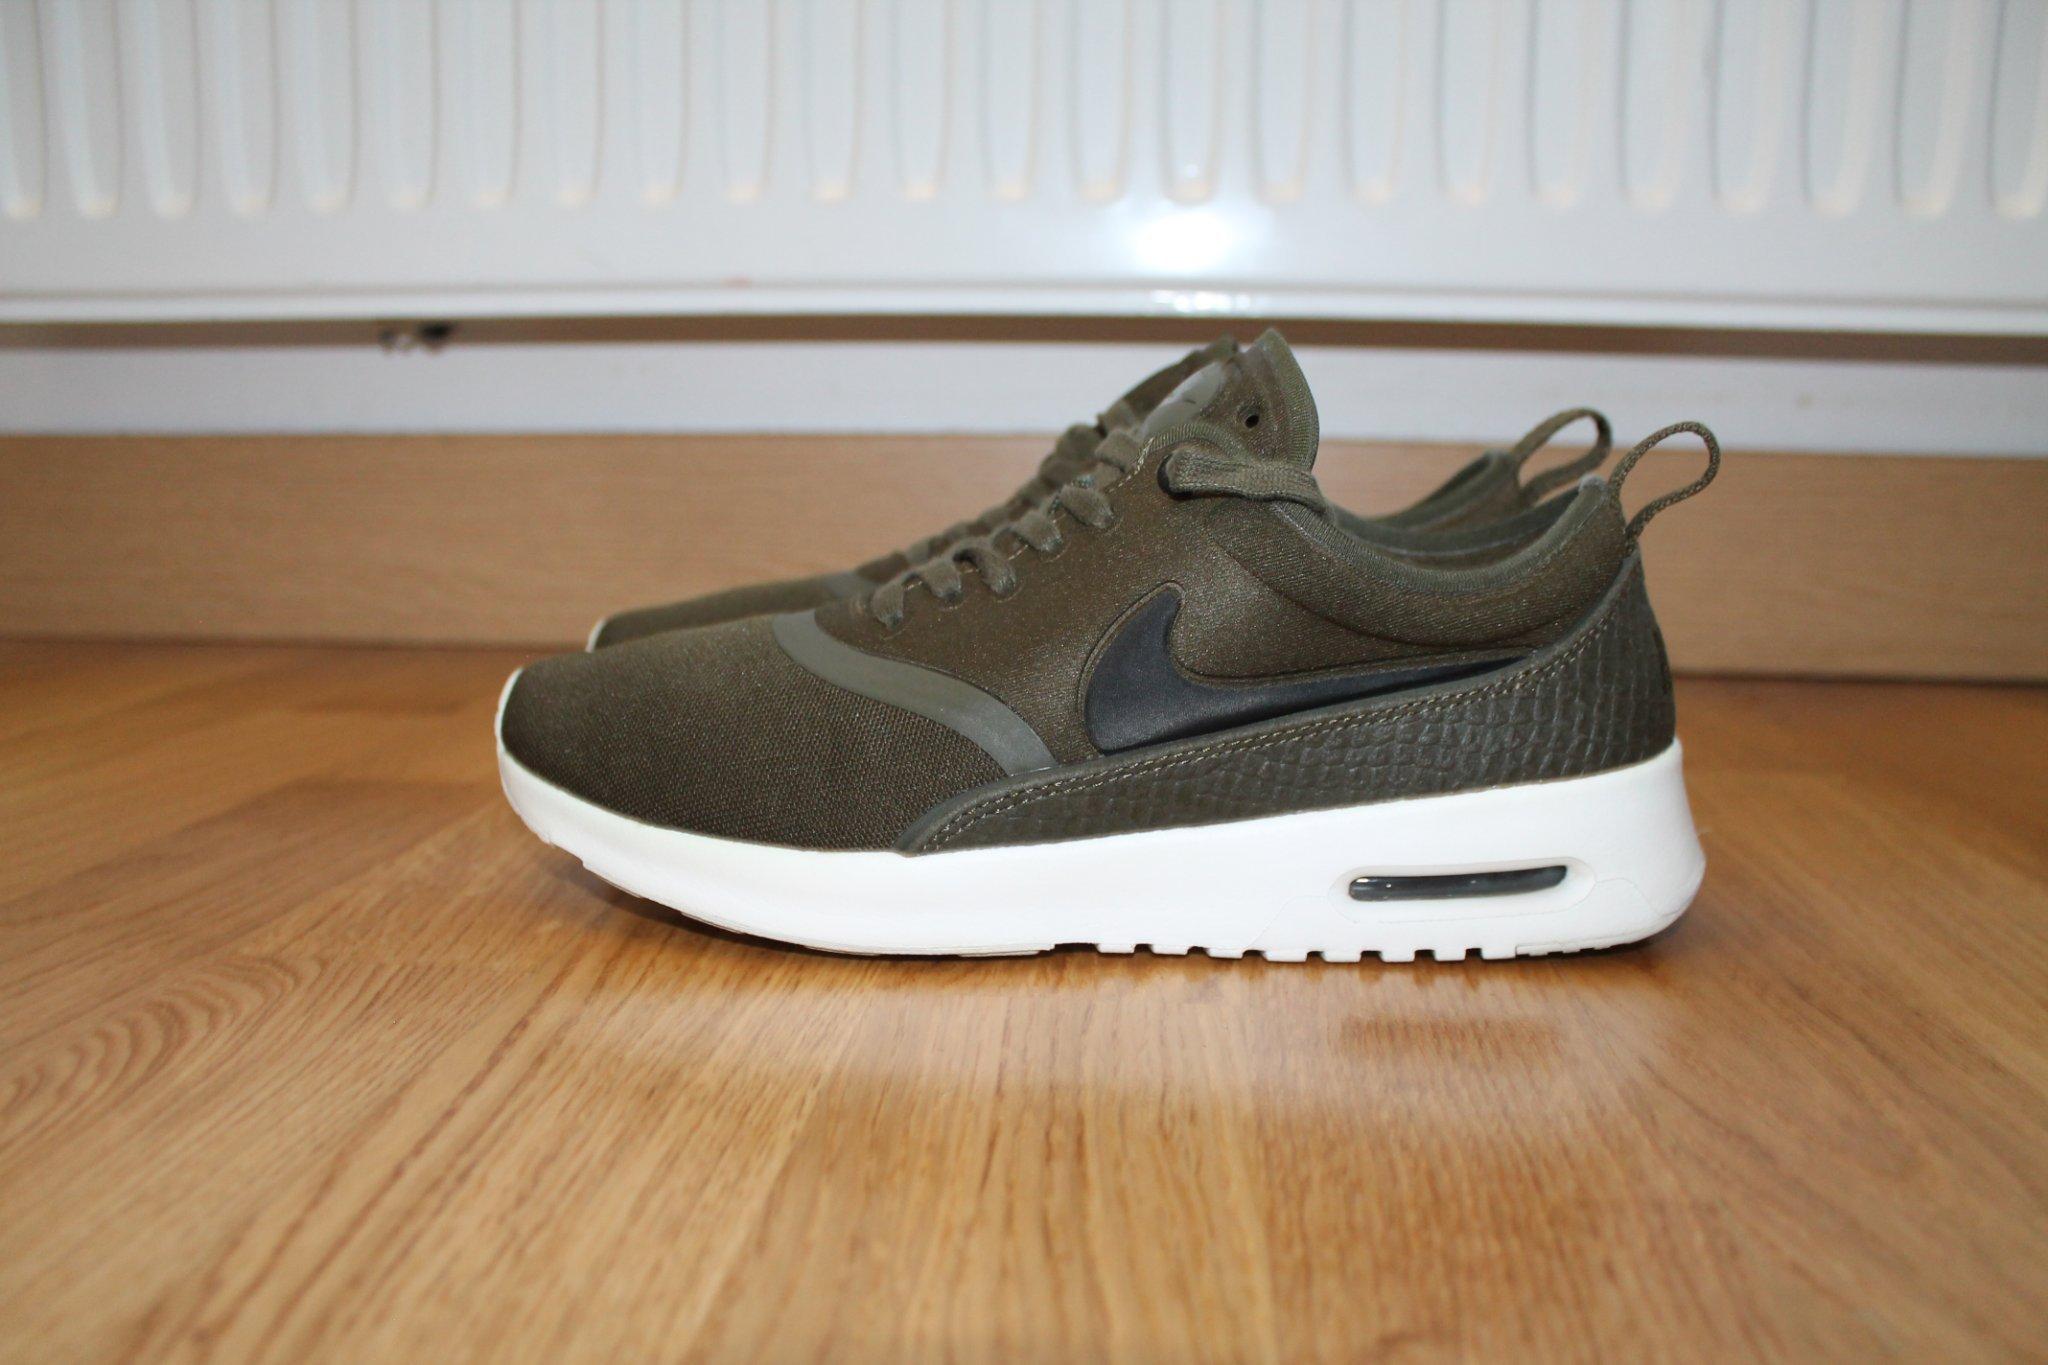 hot sale online d30e0 a2d49 Nike Air Max Thea Ultra Träningsskor i storlek 38!! i fint skick